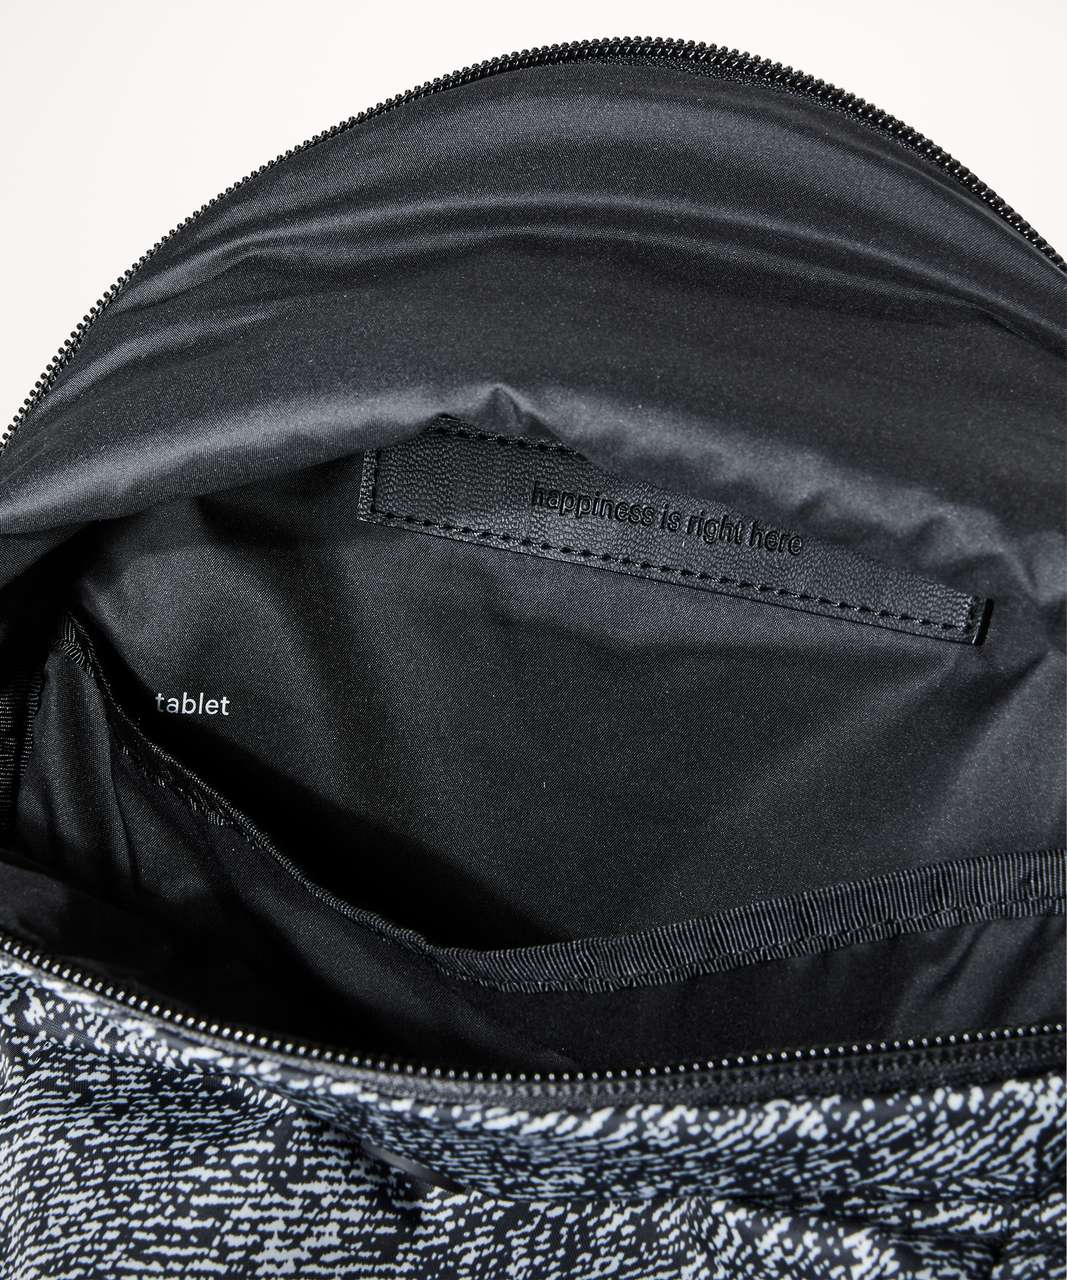 Lululemon Run All Day Backpack II *13L - Irregular Denim Twill Print Ice Grey Black / Black